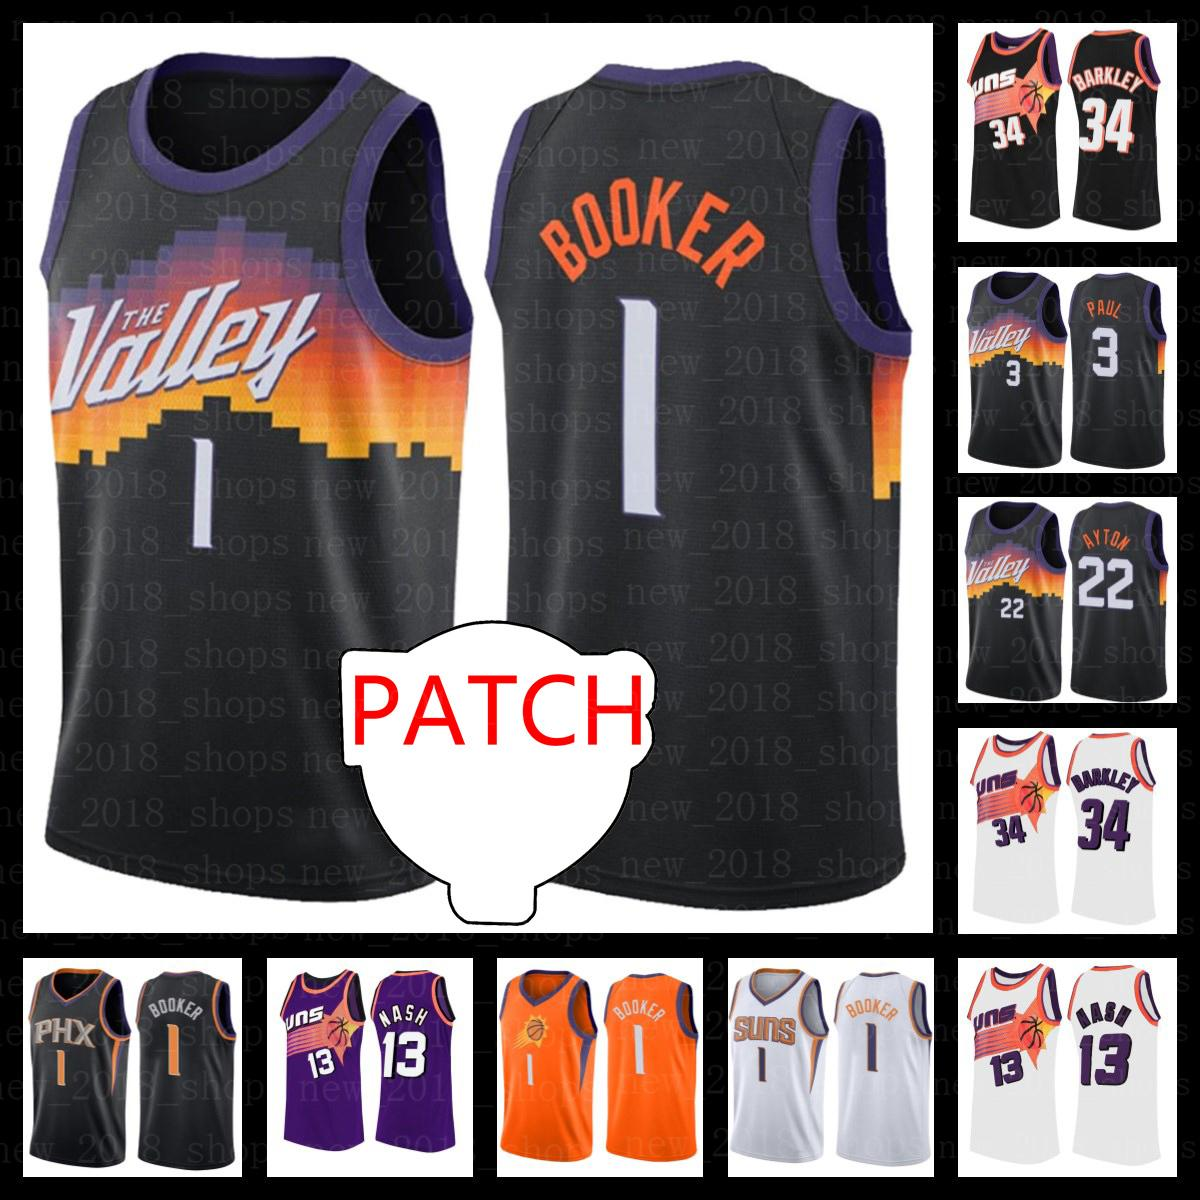 Patch final Chris 3 Paul Devin 1 Booker Jerseys Deandre 22 Ayton Charles 34 Barkley Steve 13 Nash Retro Josh 20 Jackson Basketball